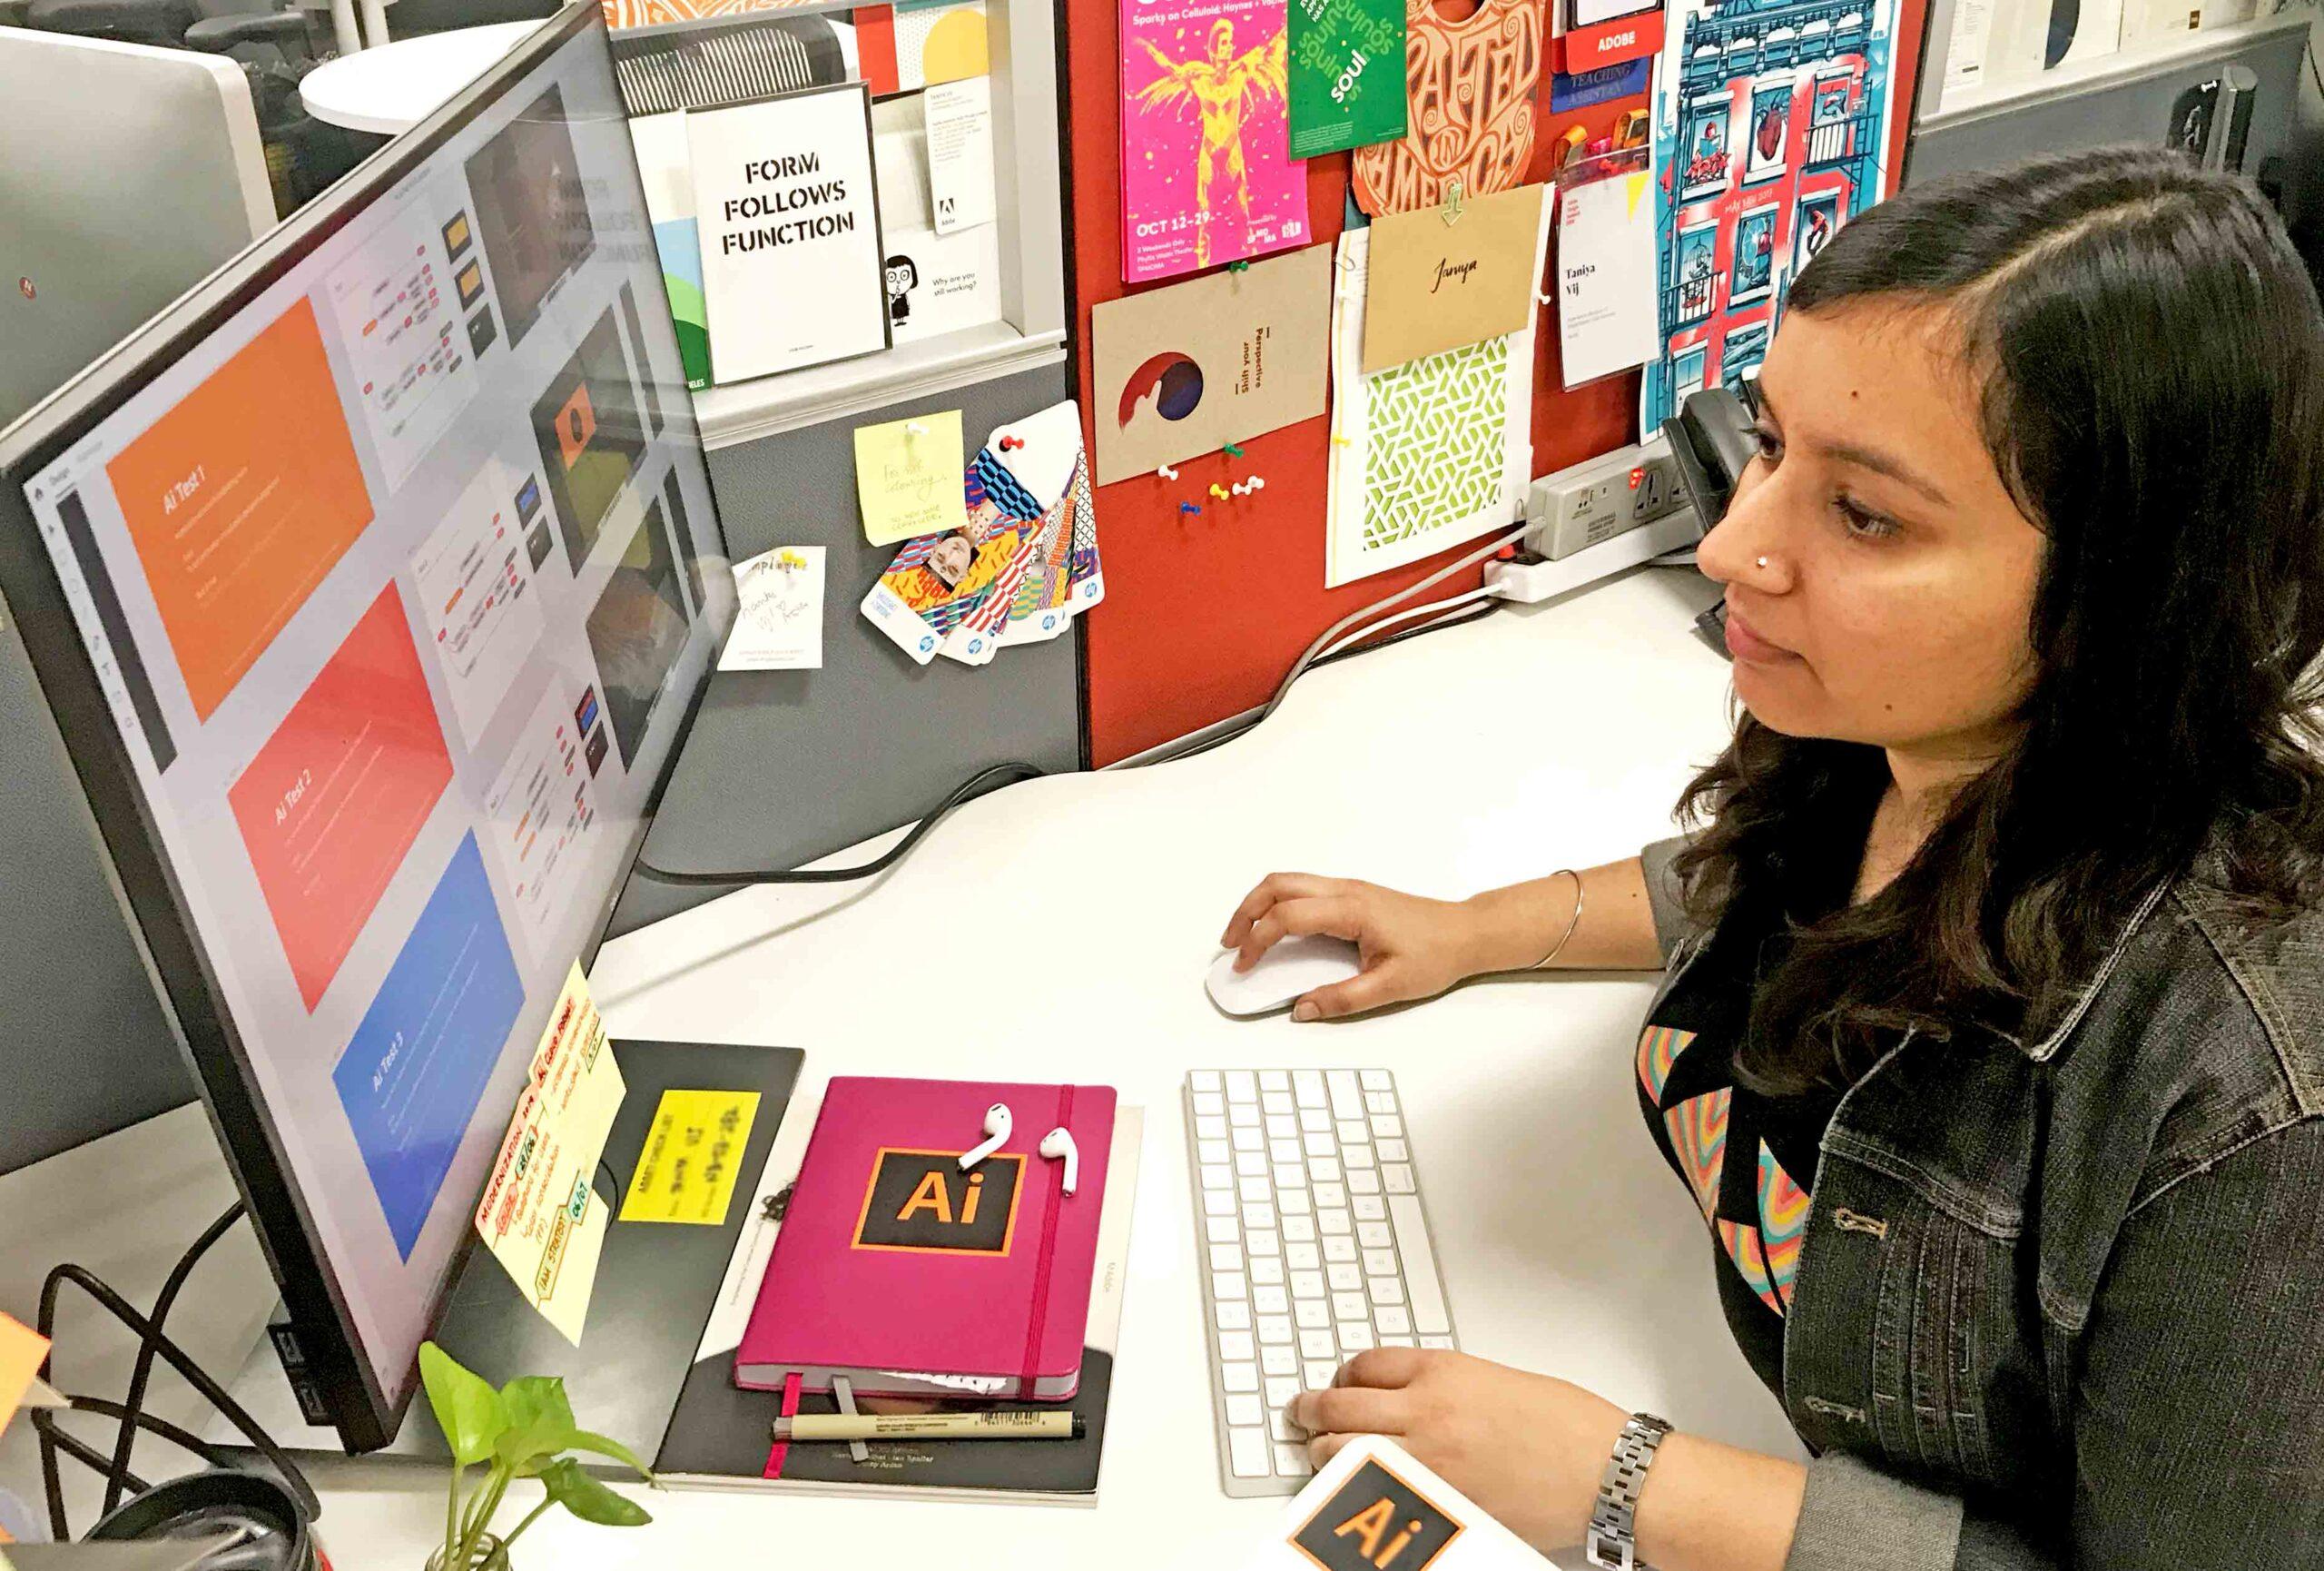 Taniya on her desk at work